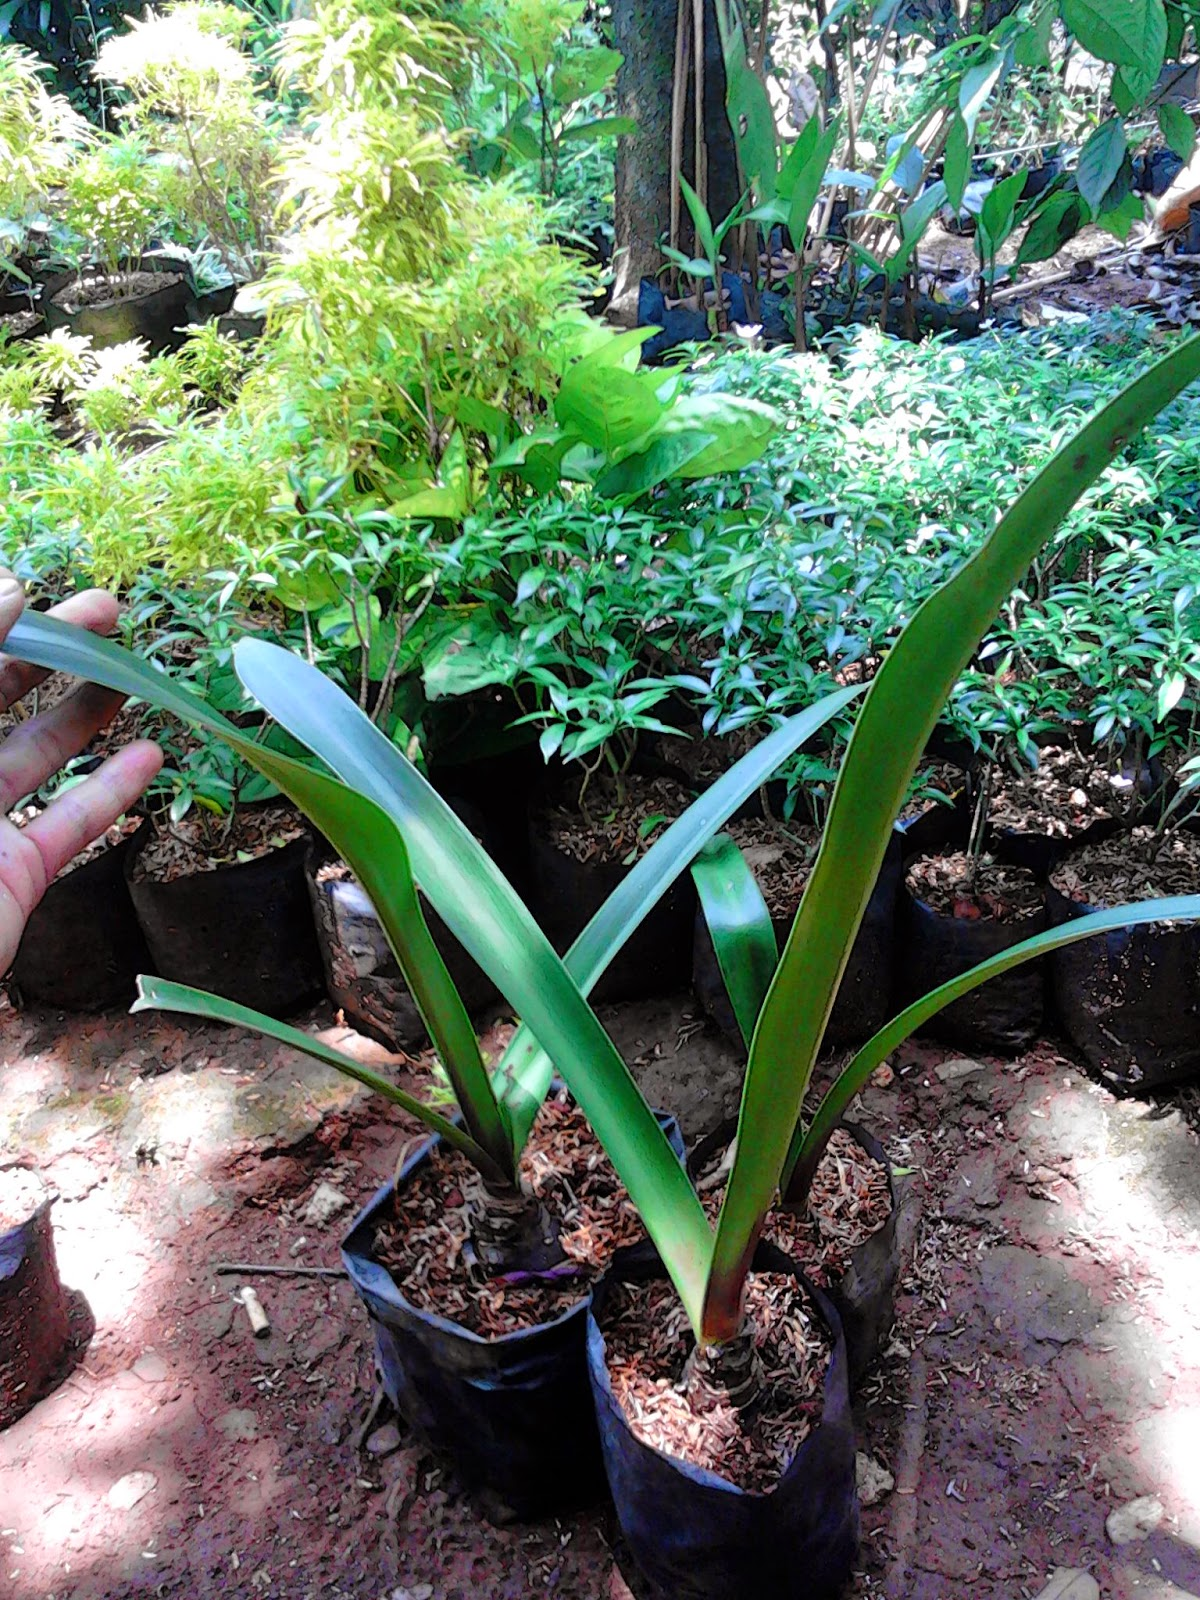 Jual pohon bakung sintung | bakung air mancur | bakung lele | suplier tanaman | tanaman hias | jasa desain taman